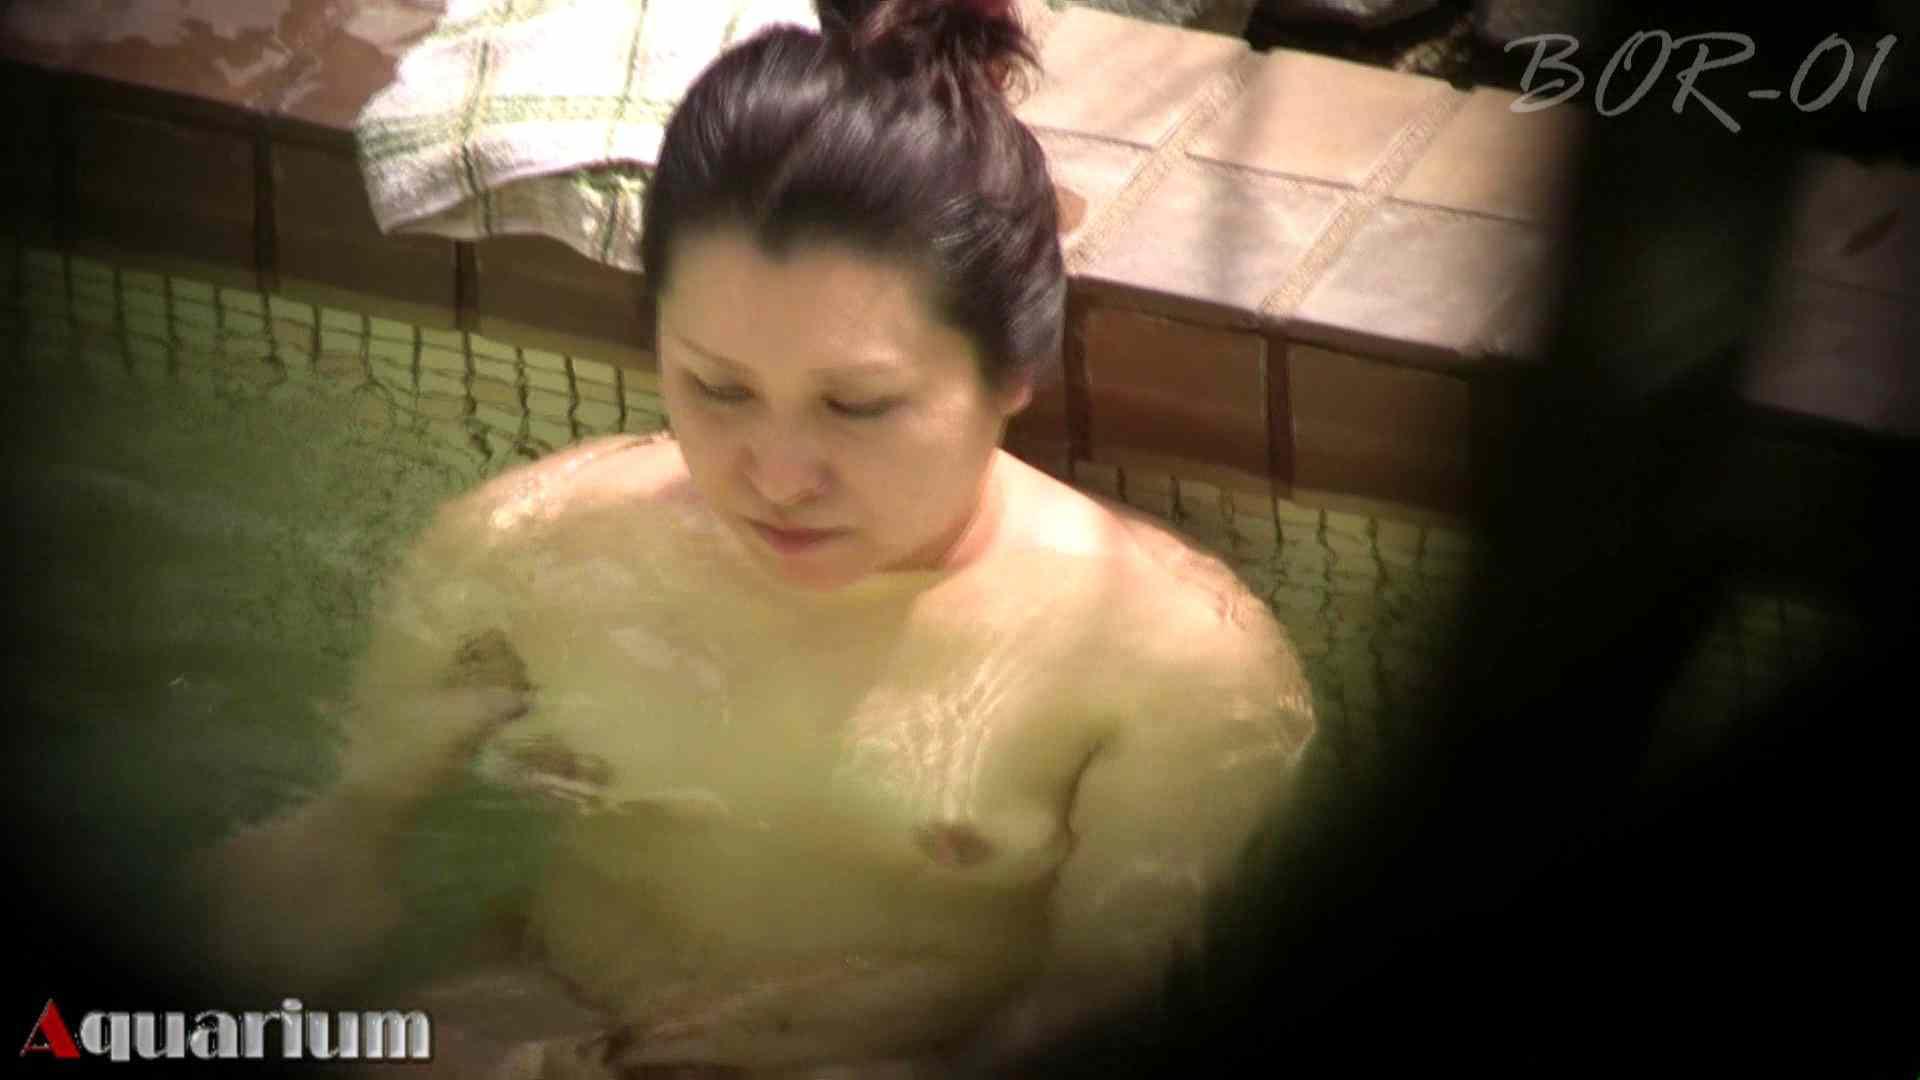 Aquaな露天風呂Vol.458 露天風呂 | OLのエロ生活  29連発 7